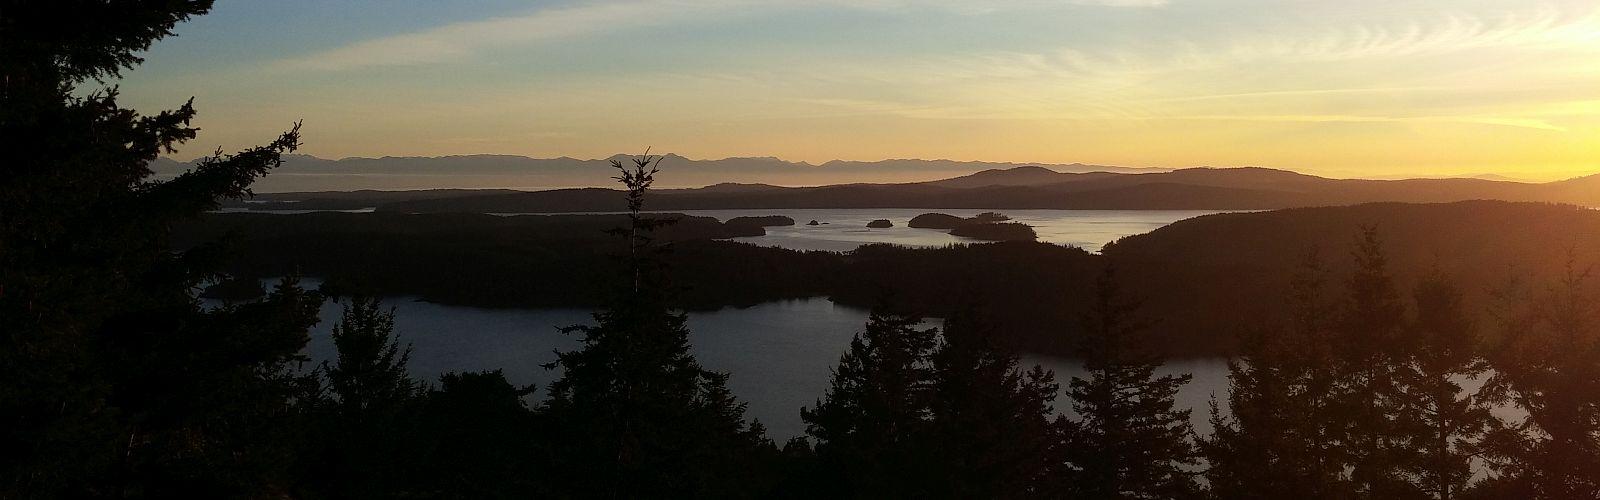 View from Turtleback Mountain Caroline Armon